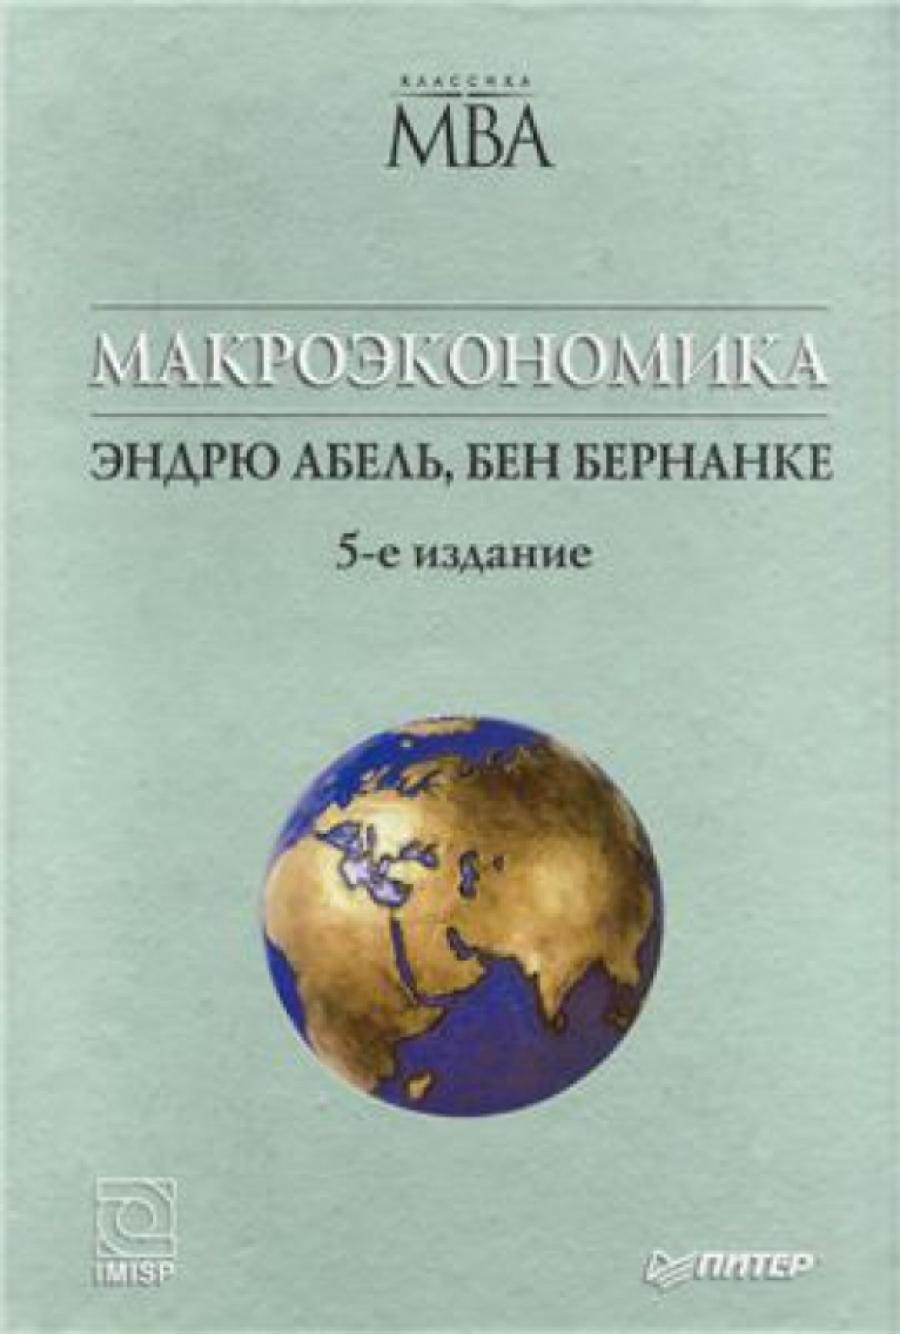 Обложка книги:  классика mba - абель, бернанке - макроэкономика